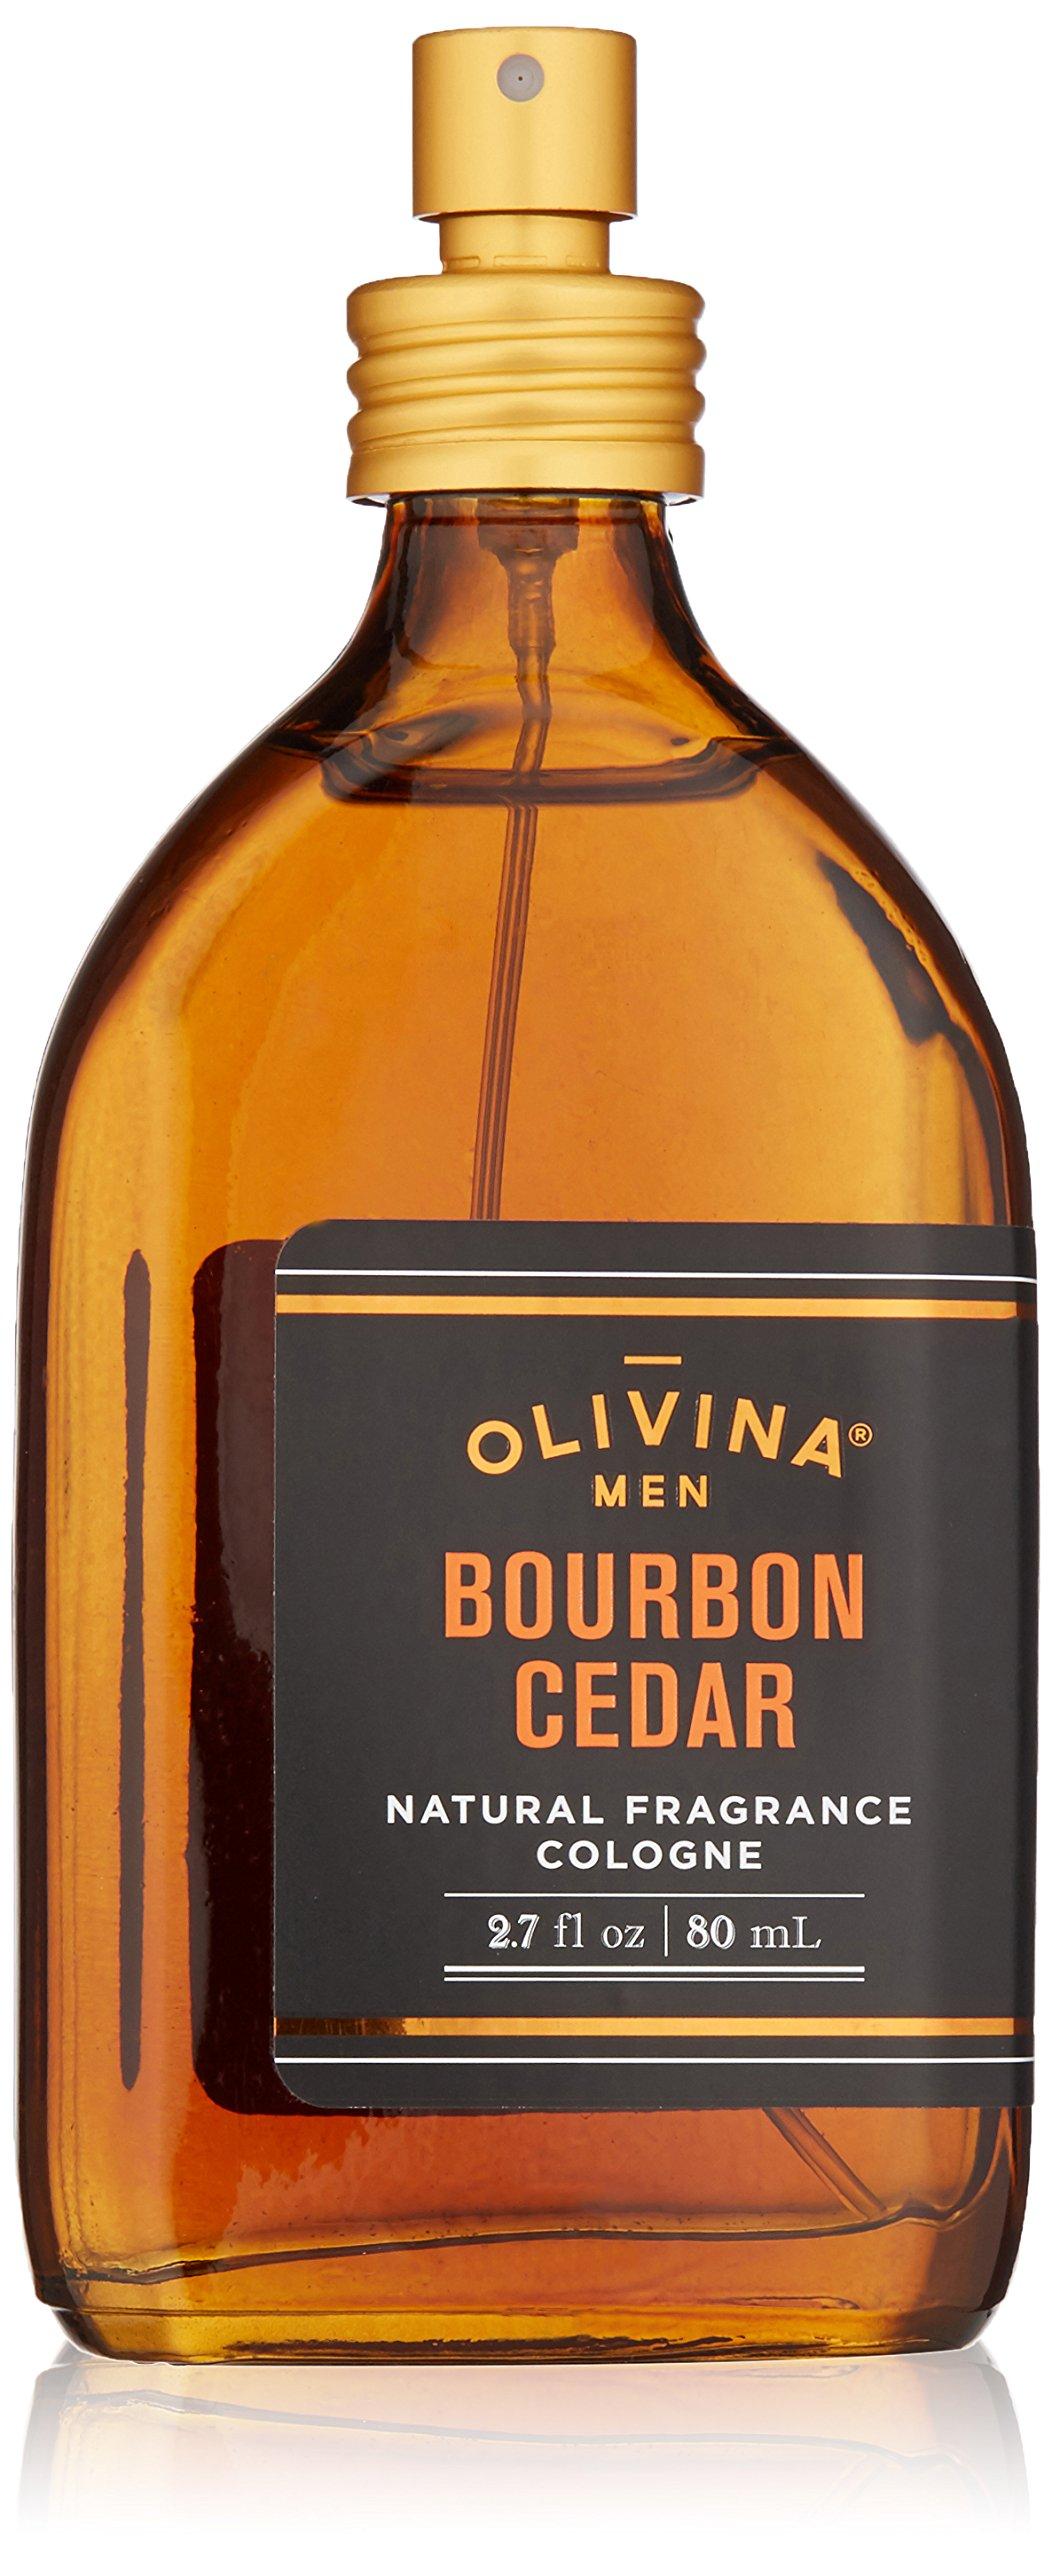 Olivina Men Natural Fragrance Cologne In Wood Box, 2.7 Fluid Ounce